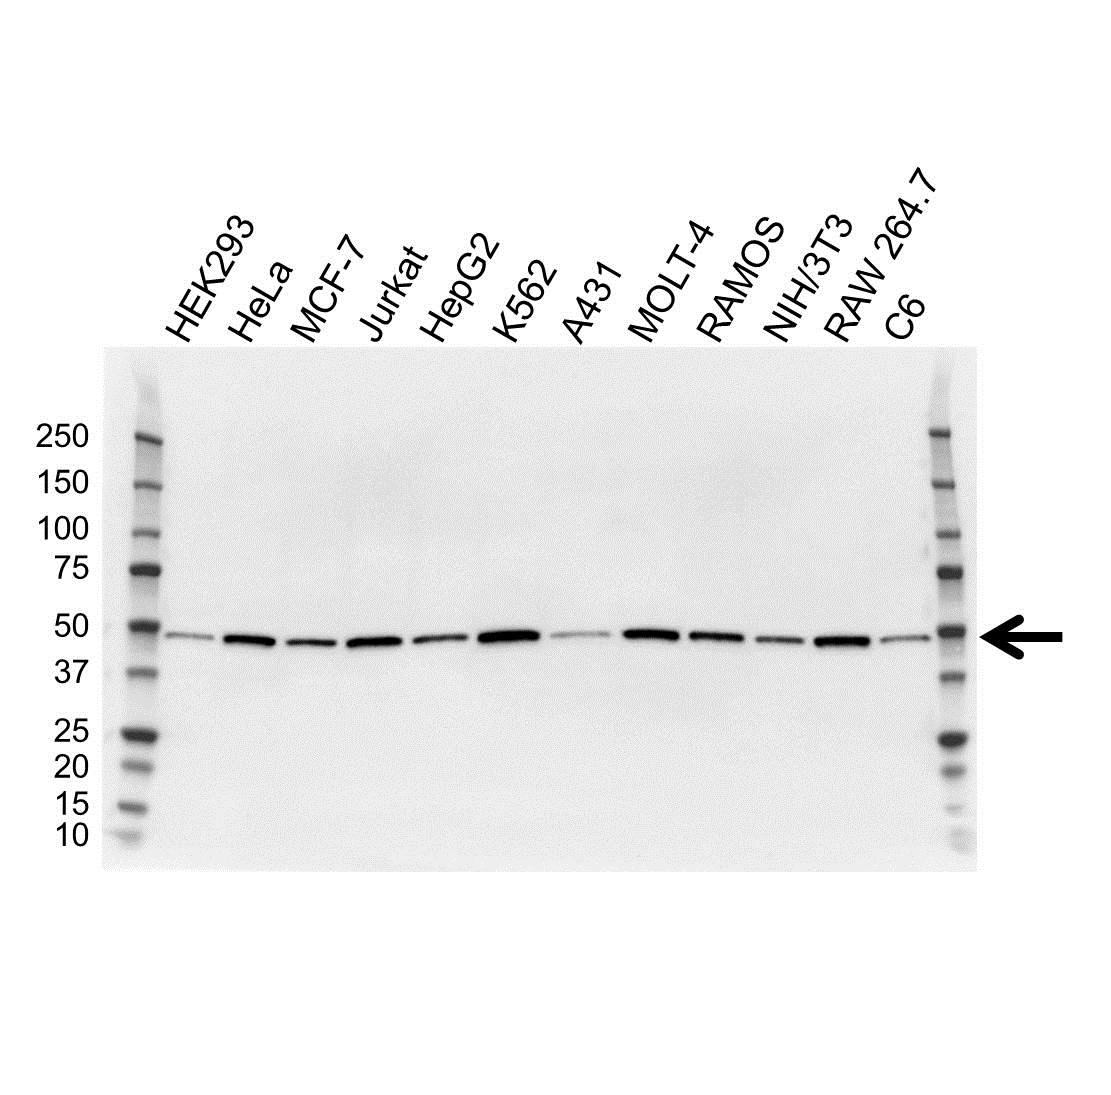 Anti Proliferation Associated Protein 2G4 Antibody, clone OTI1D3 (PrecisionAb Monoclonal Antibody) gallery image 1